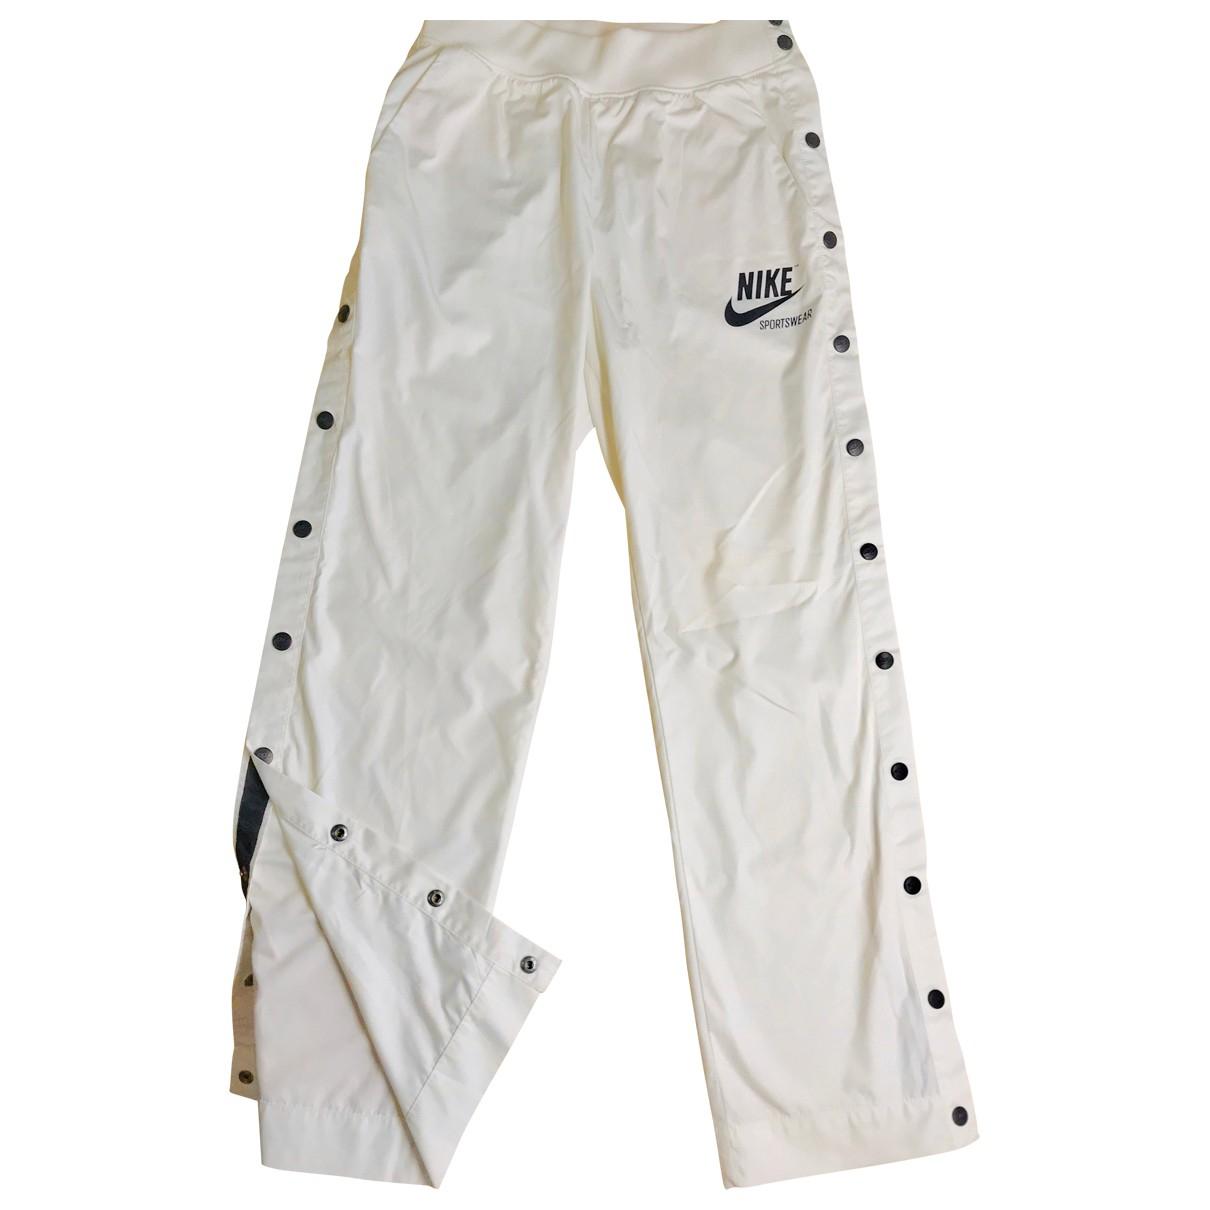 Nike \N White jumpsuit for Women XS International